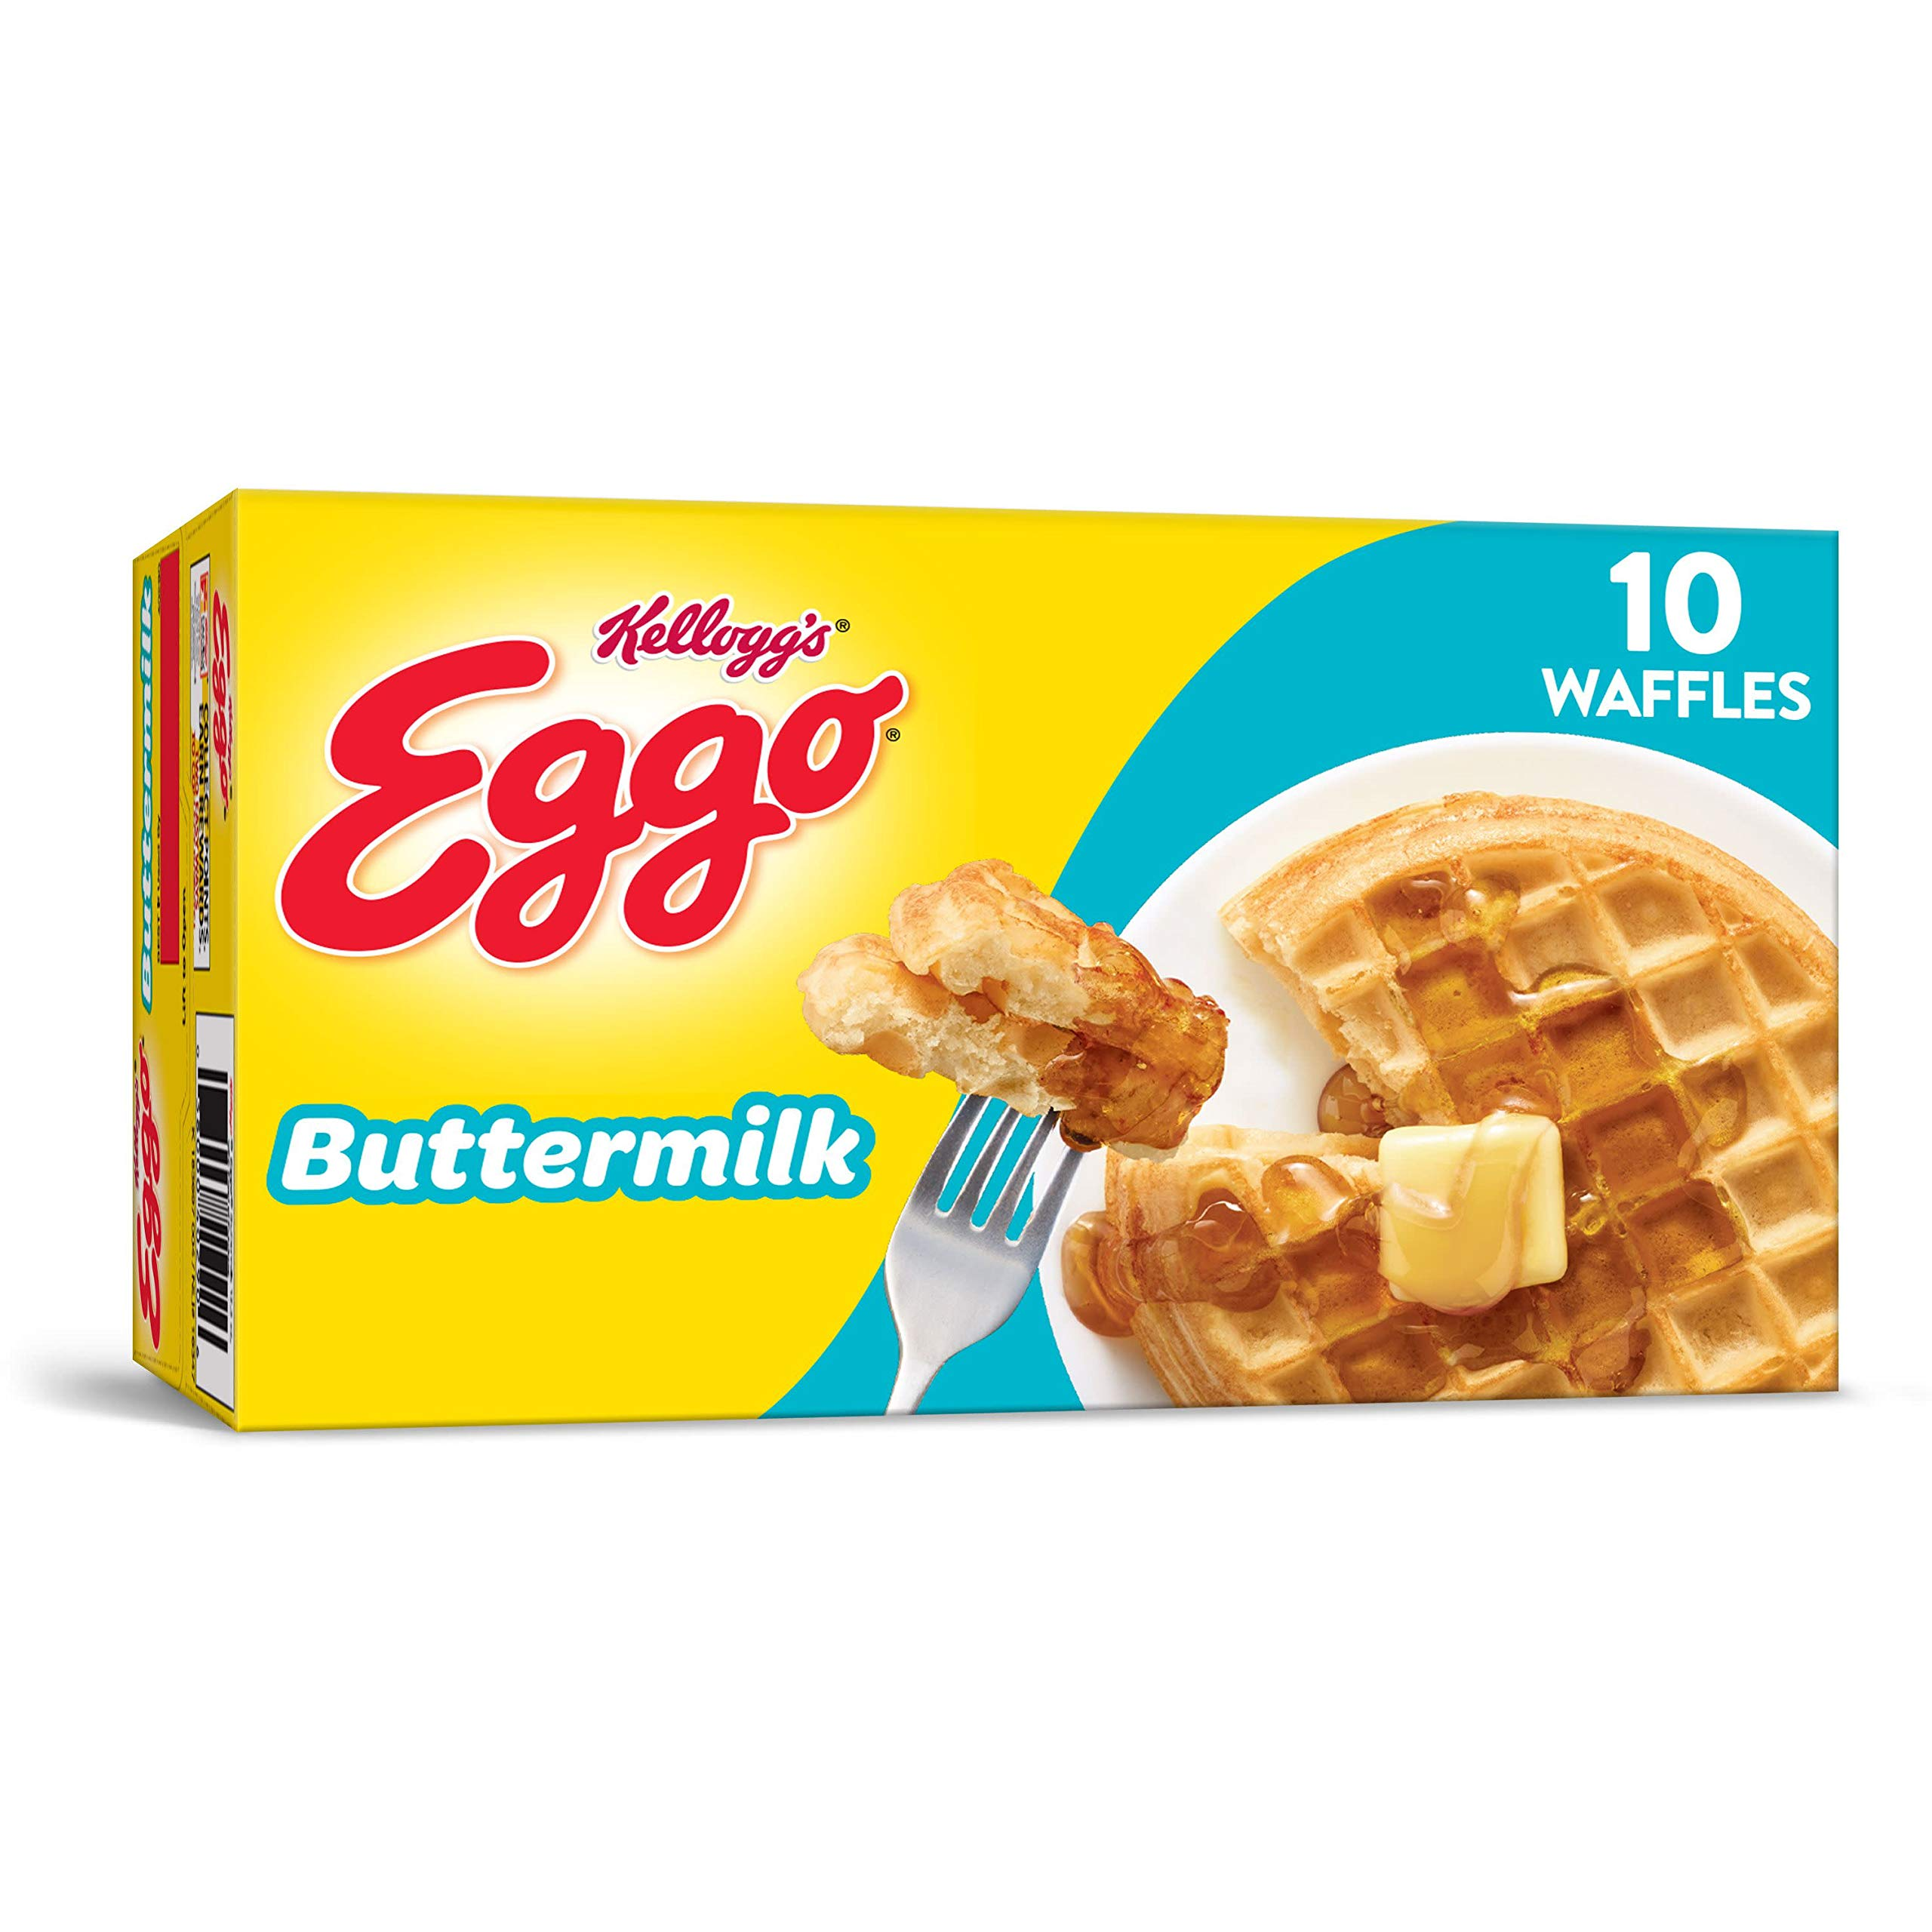 Kellogg's Eggo, Frozen Waffles, Homestyle, Easy Breakfast, 12.3 oz Box (10 Count)